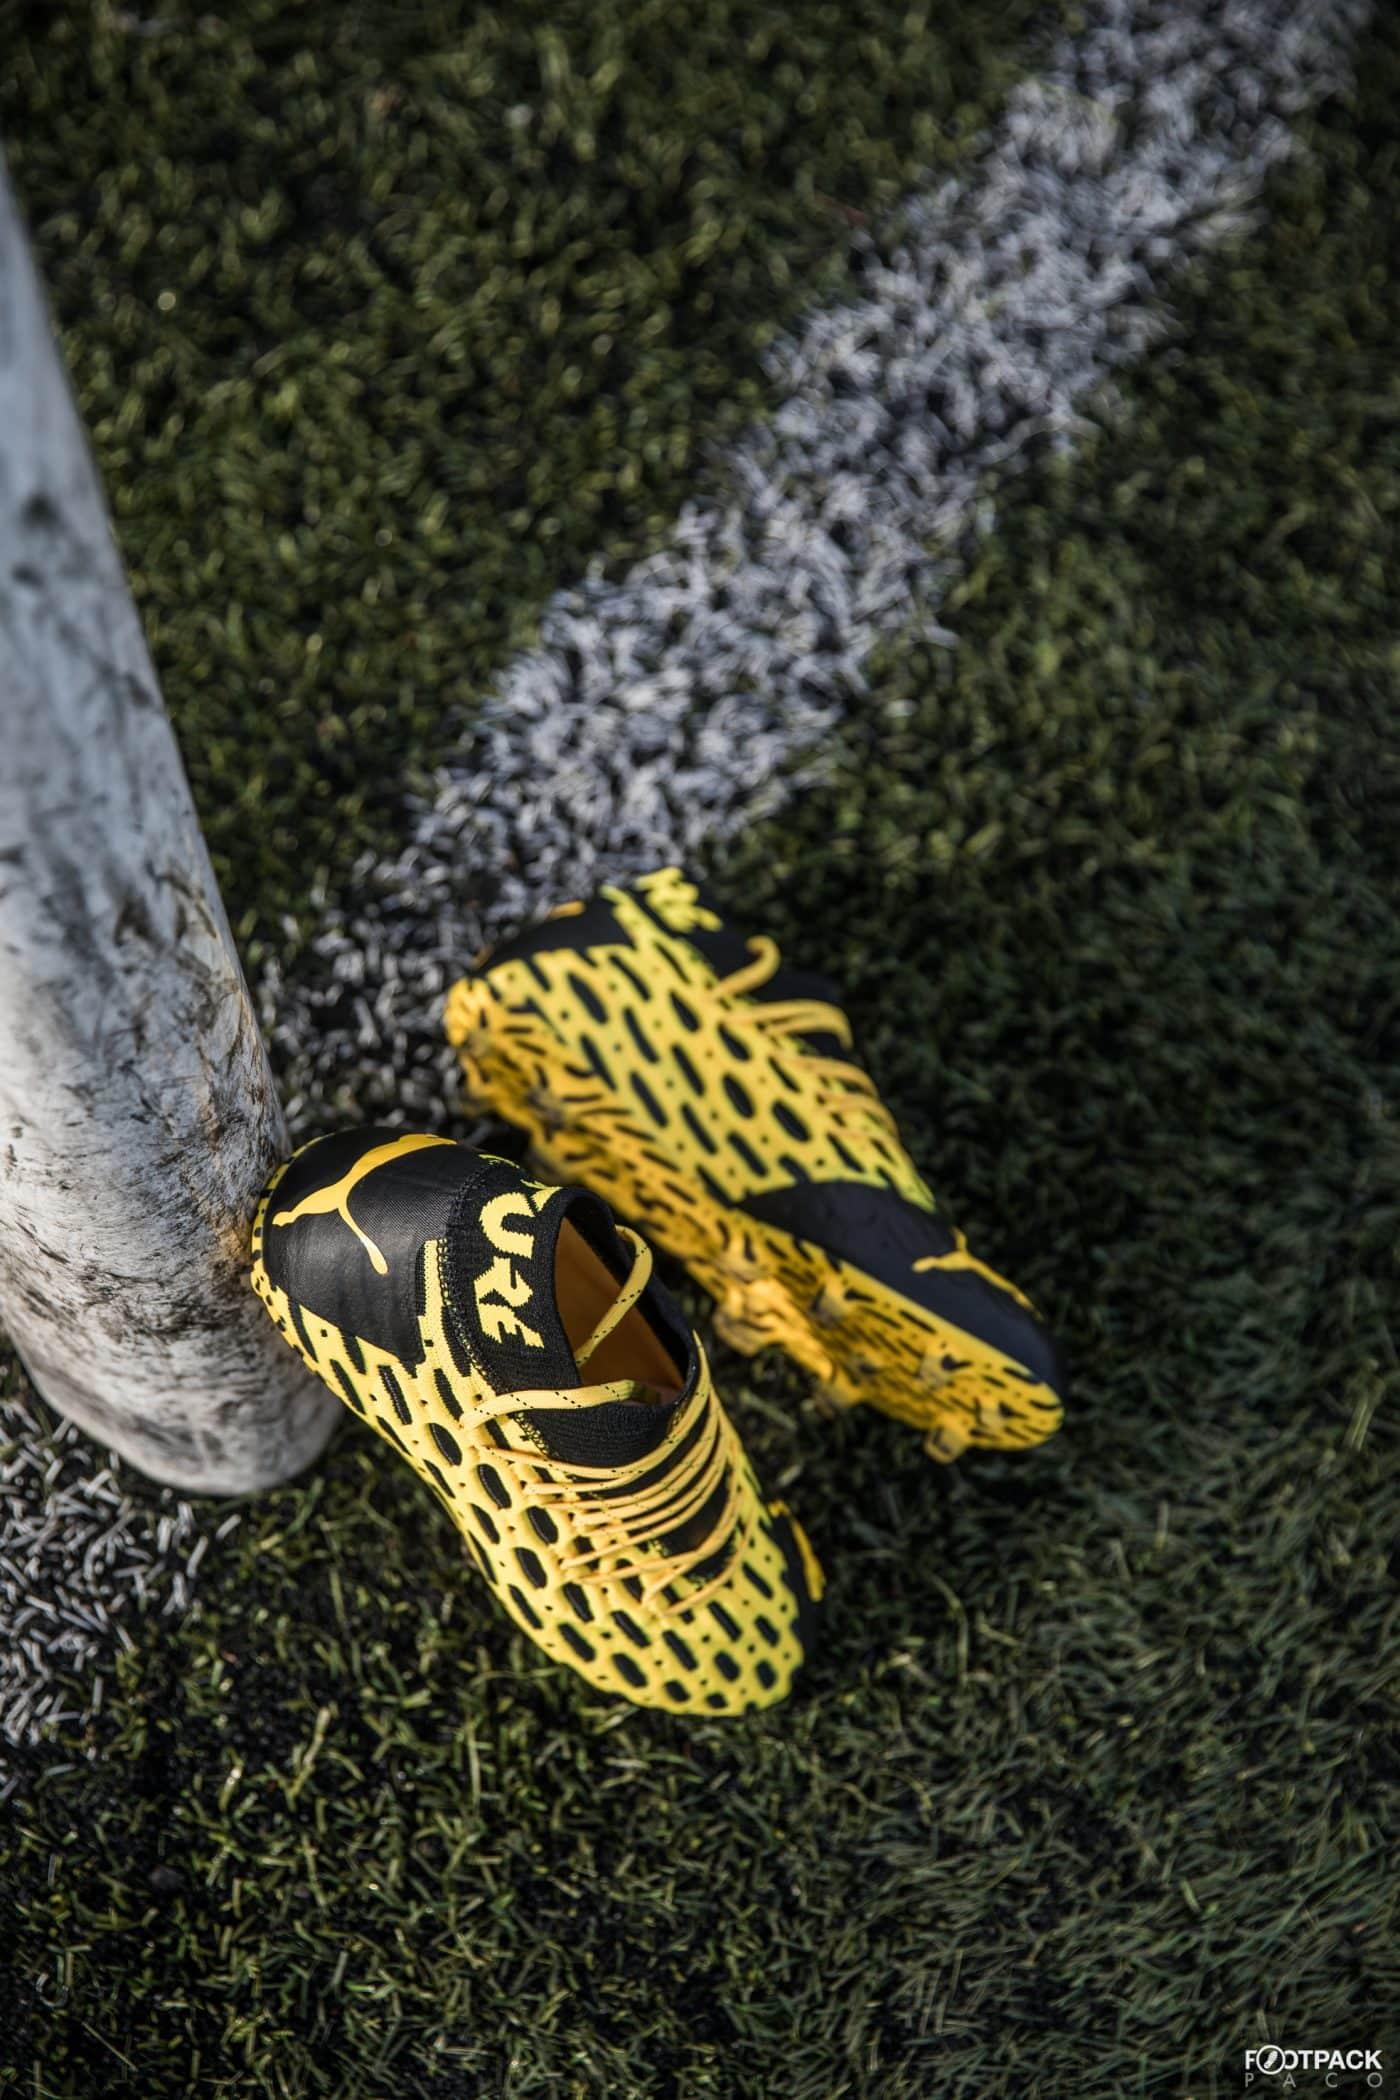 chaussures-de-foot-puma-future-5.1-spark-janvier-2020-footpack-12